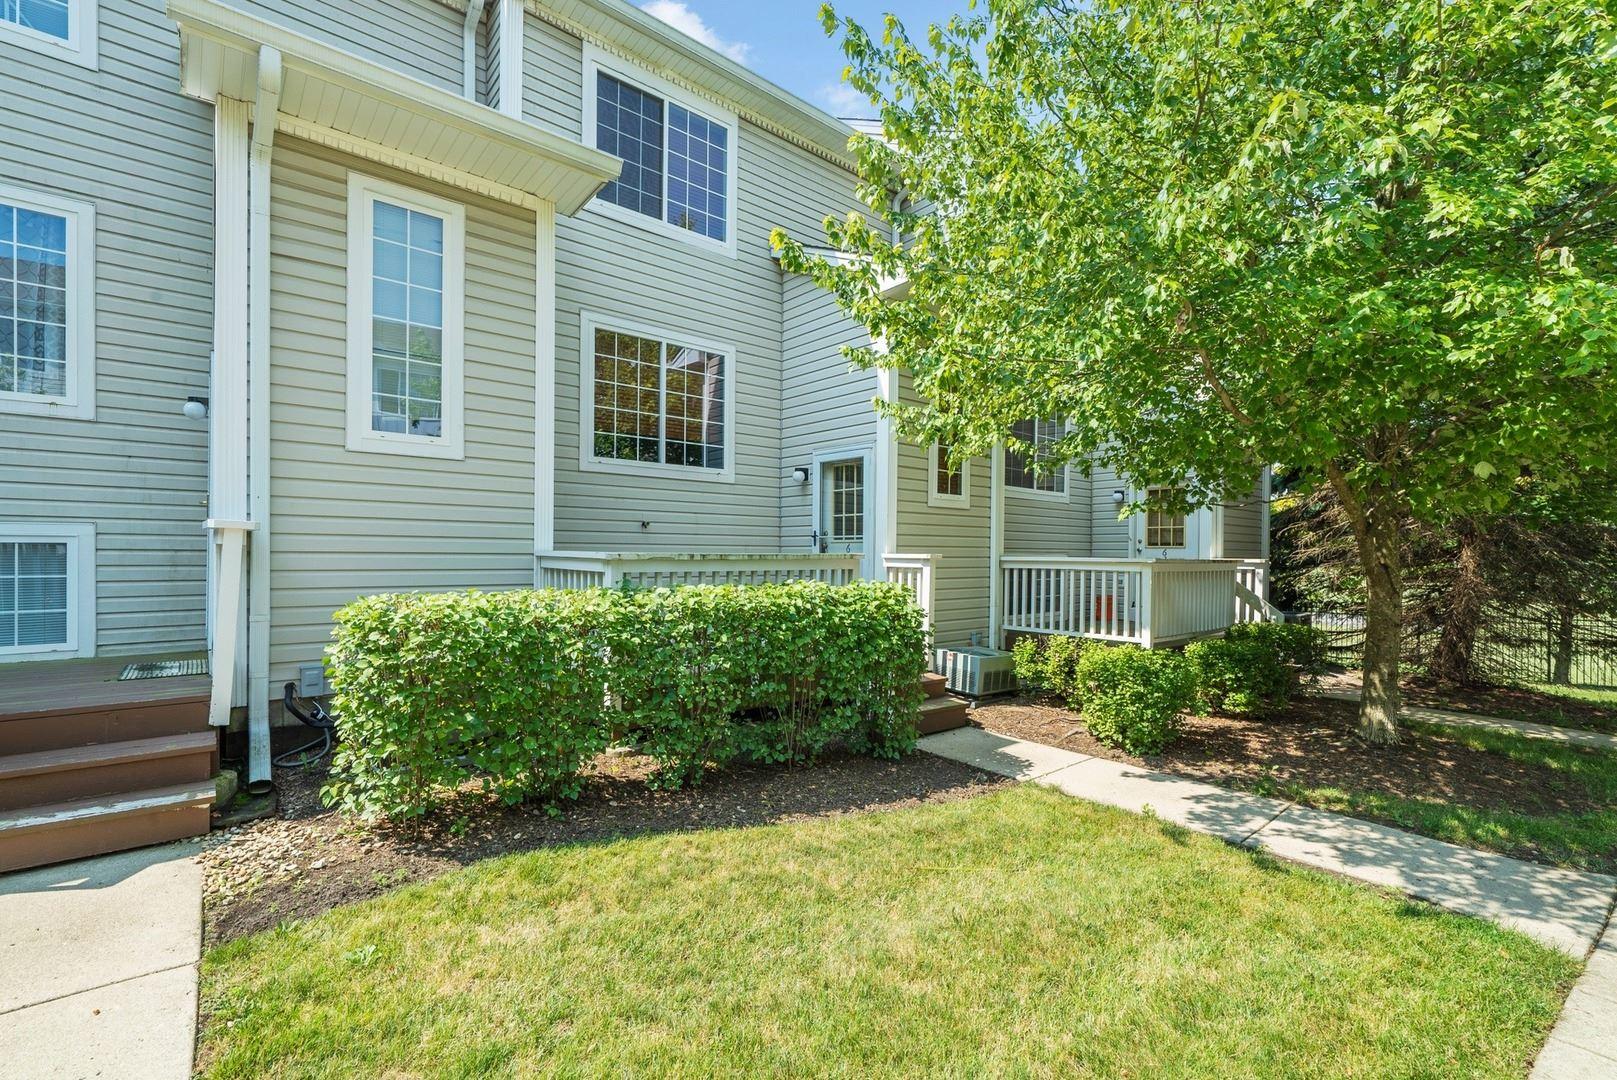 61 S Treehouse Lane, Round Lake, IL 60073 - #: 10781216